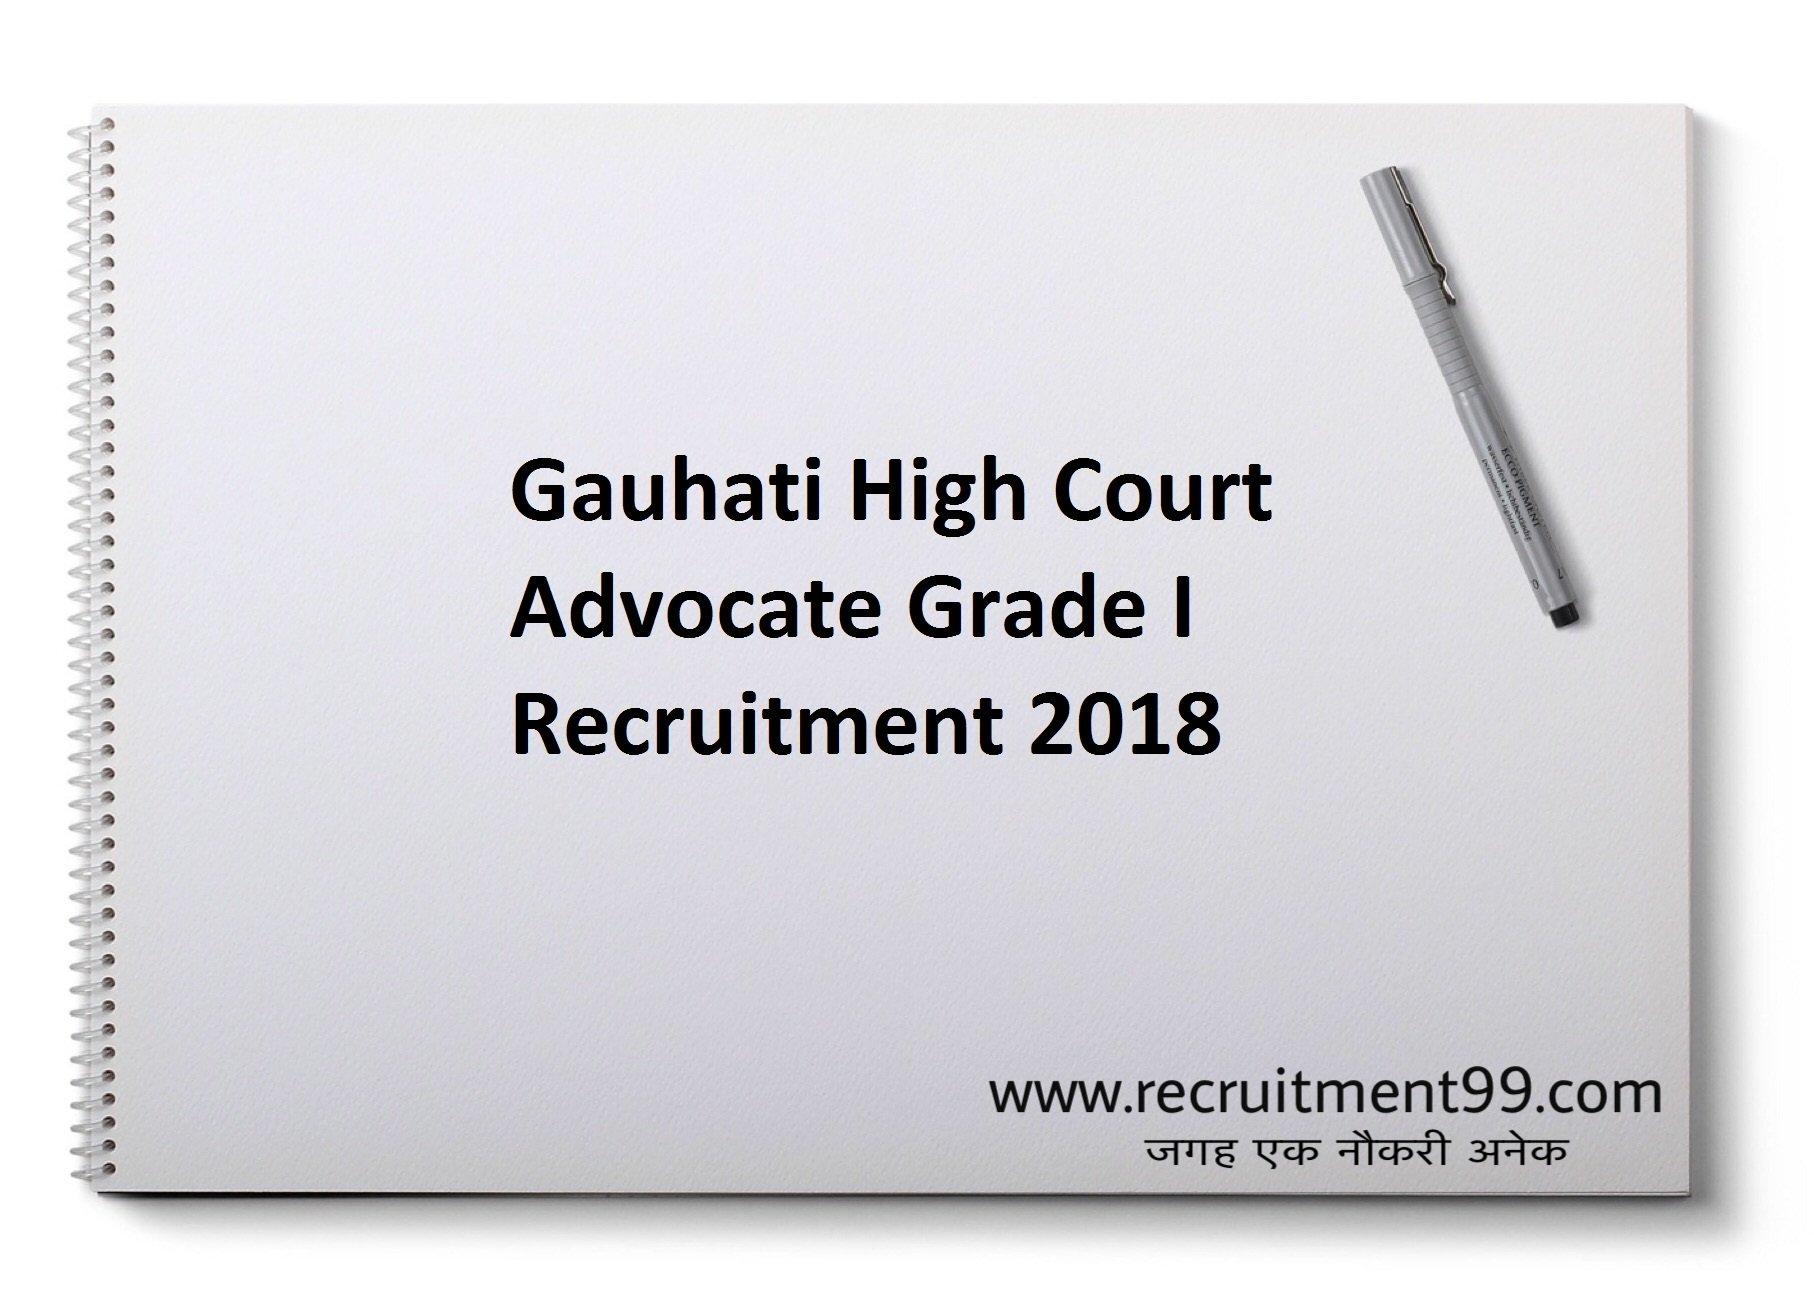 Gauhati High Court Advocate Recruitment Admit Card Result 2018